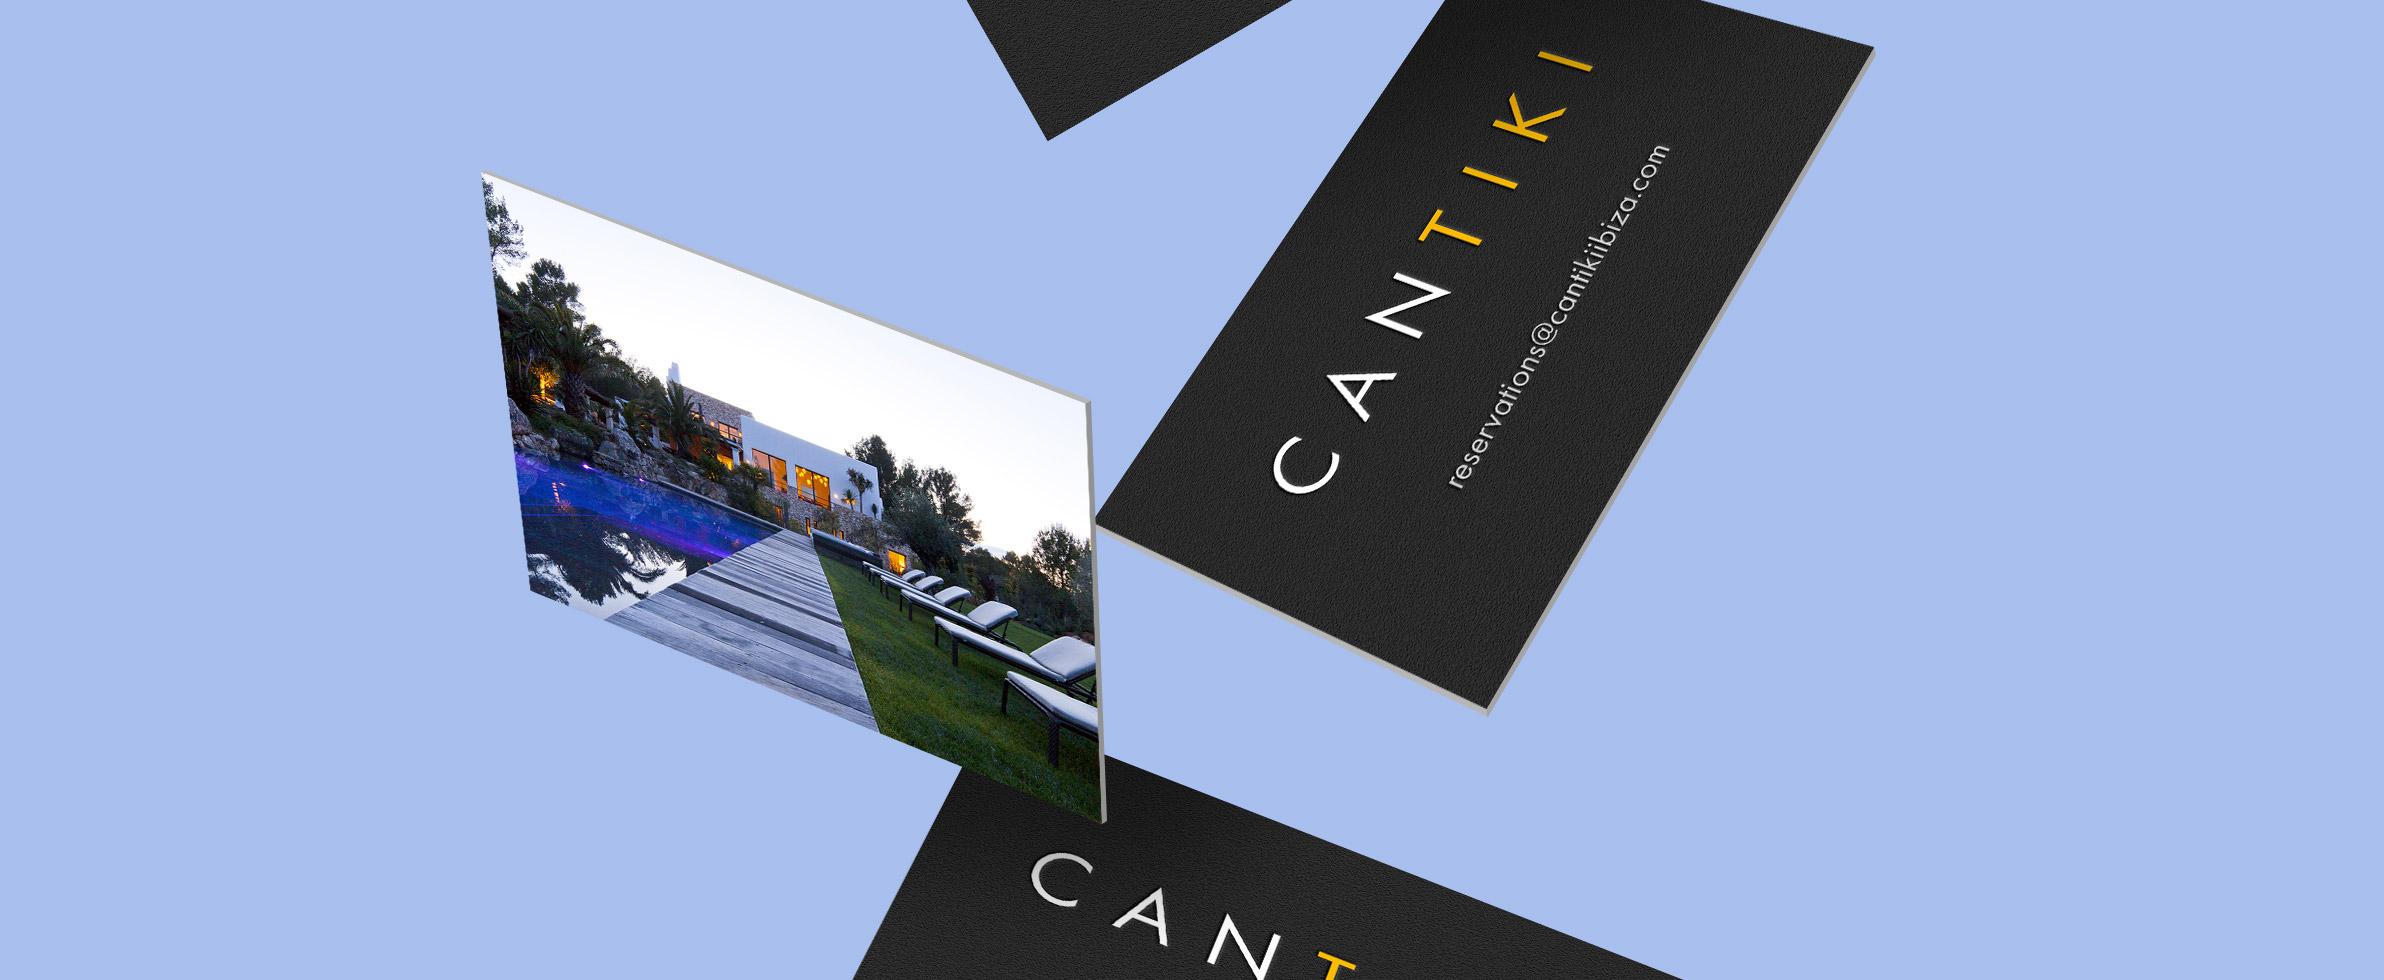 Can Tiki villa branding, logo and business card design